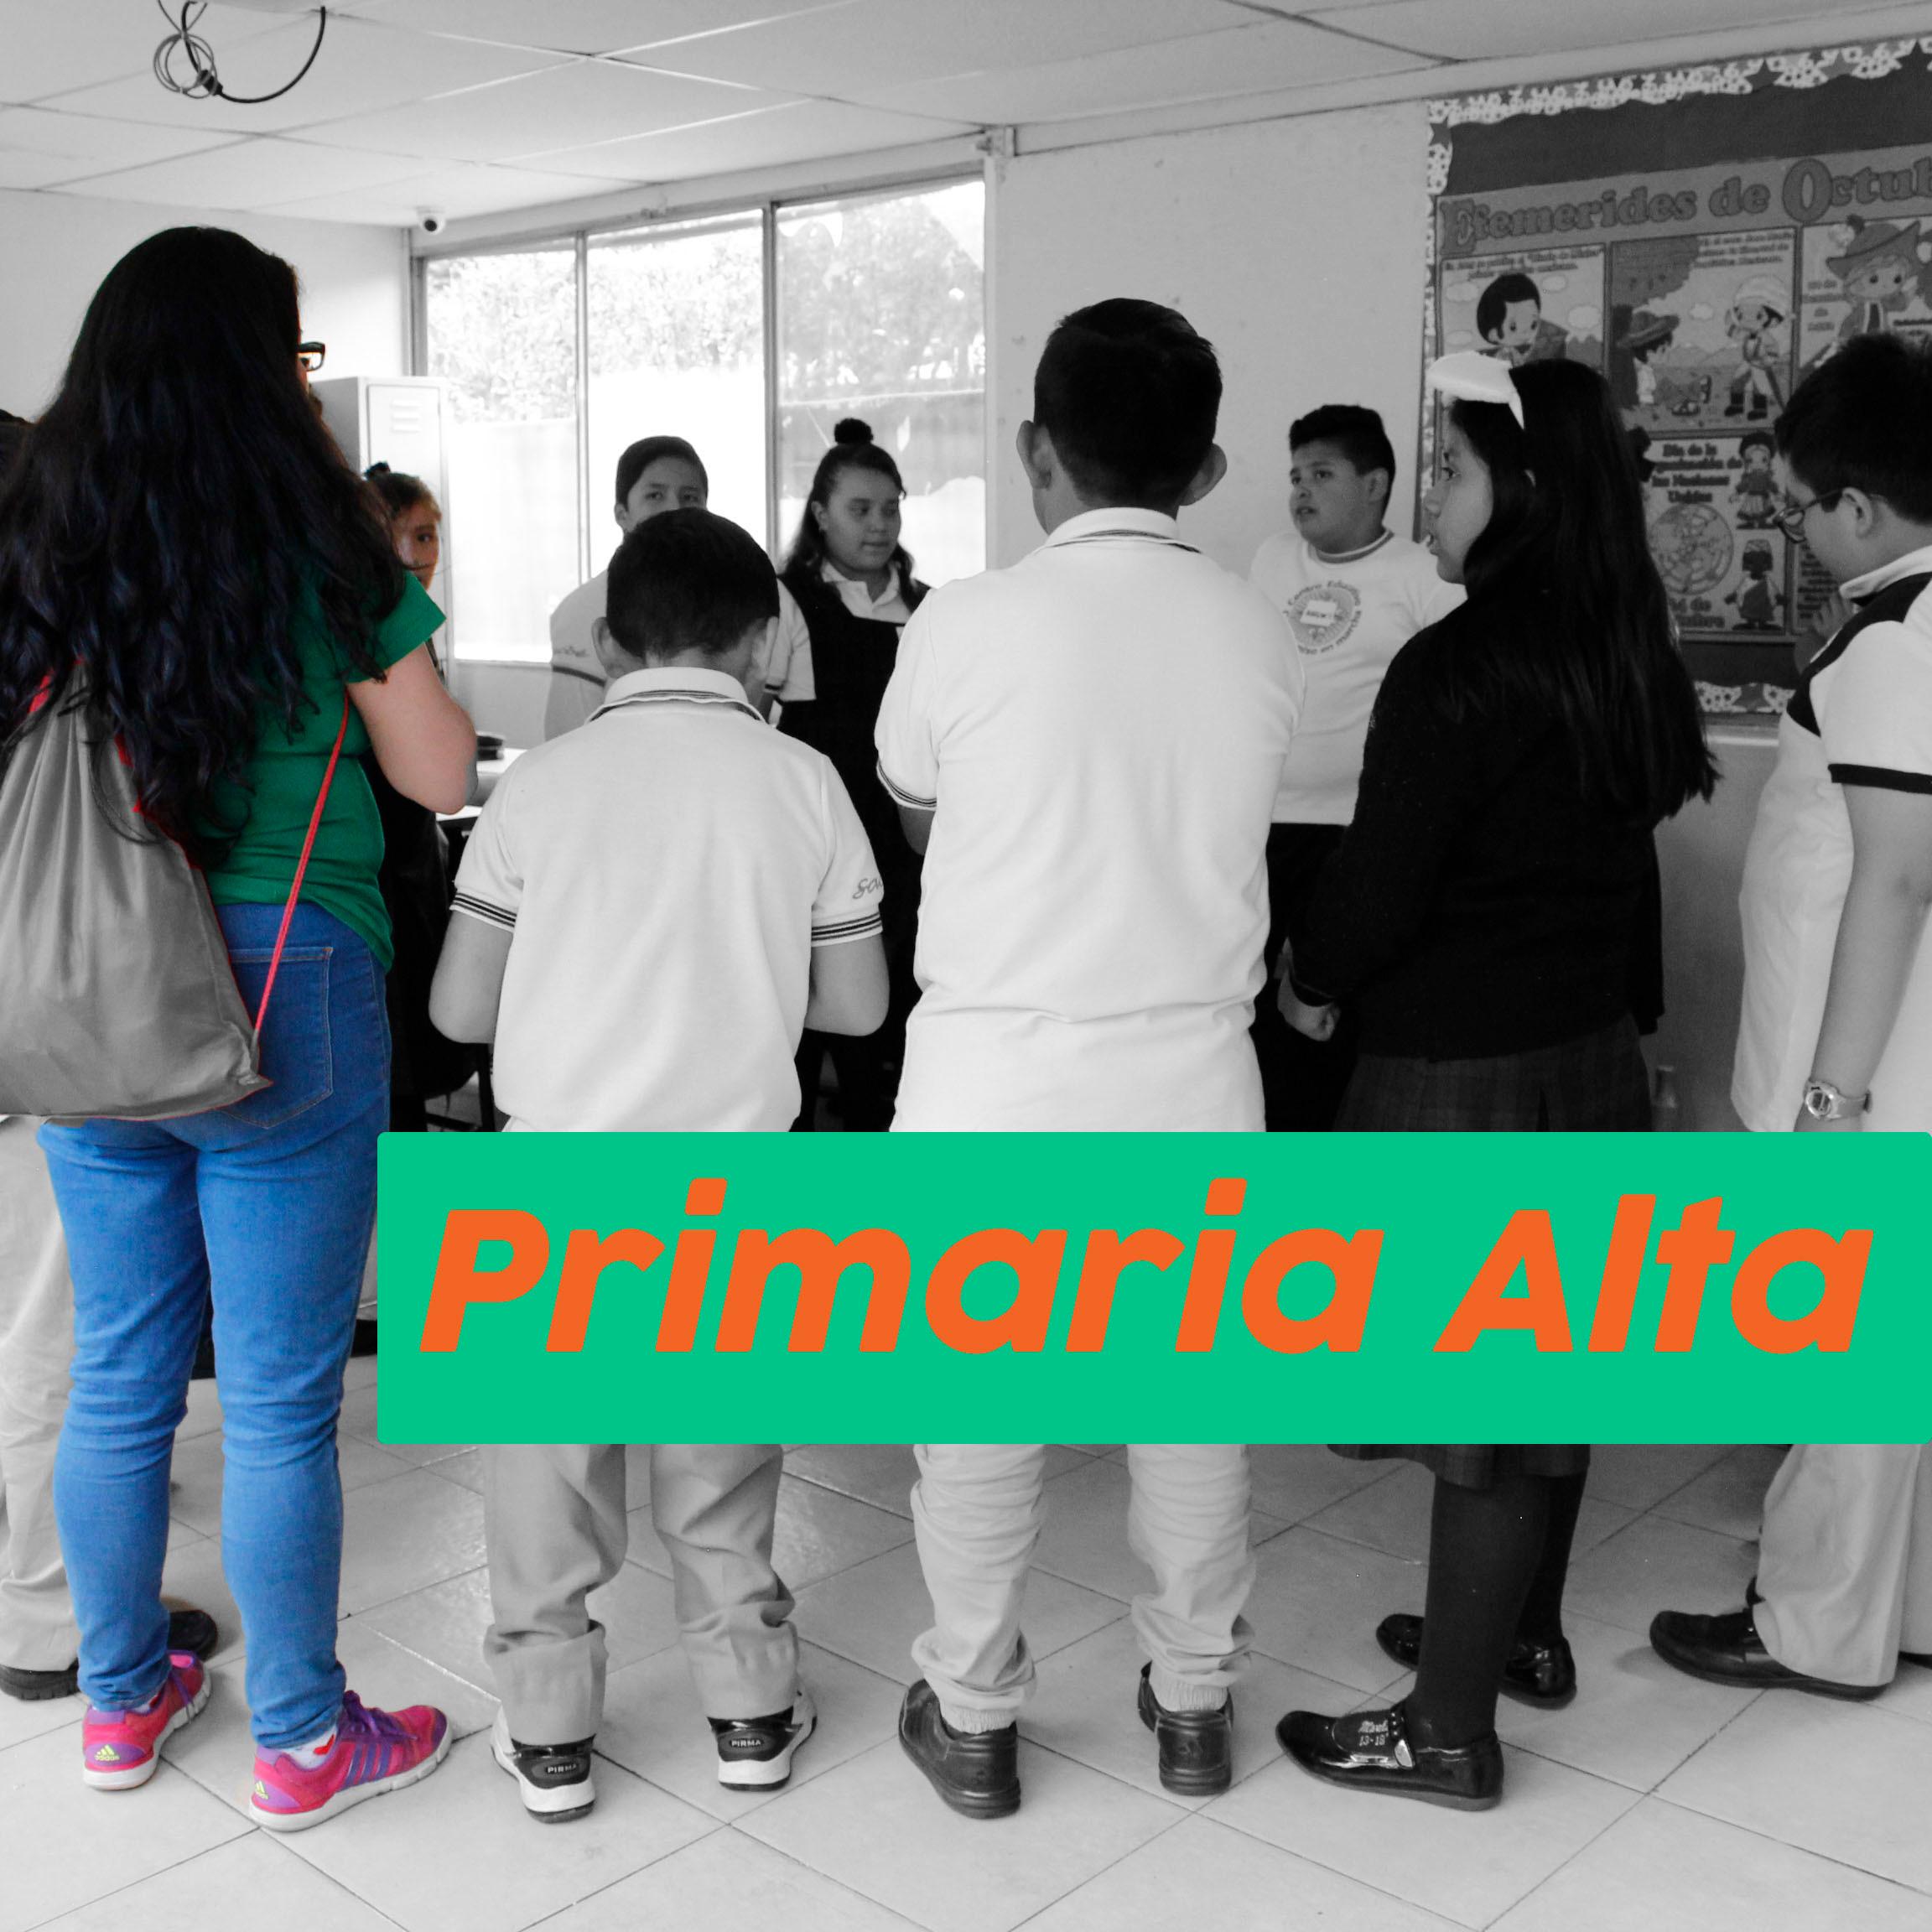 AfterEsCool - Primaria Alta